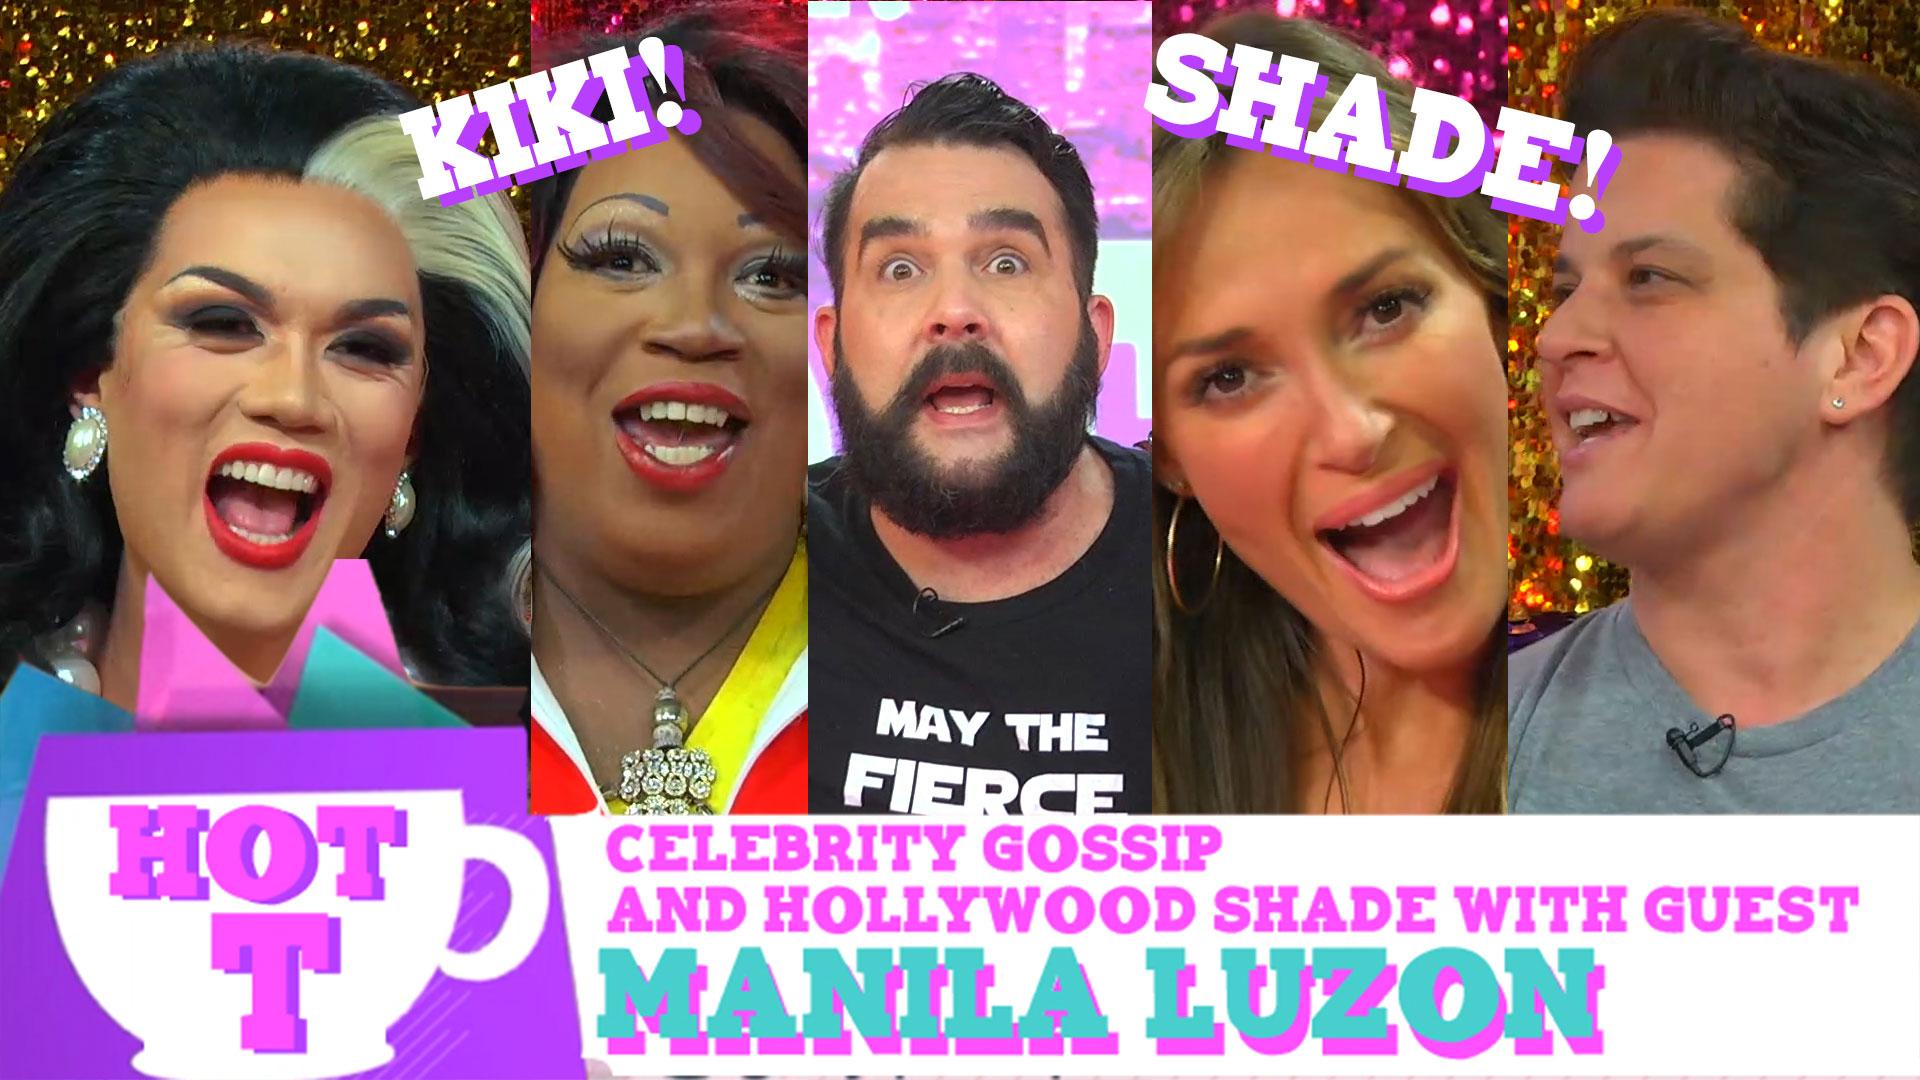 Manila Luzon on HOT T: Celebrity Gossip & Hollywood Shade Season 2 Episode 4!